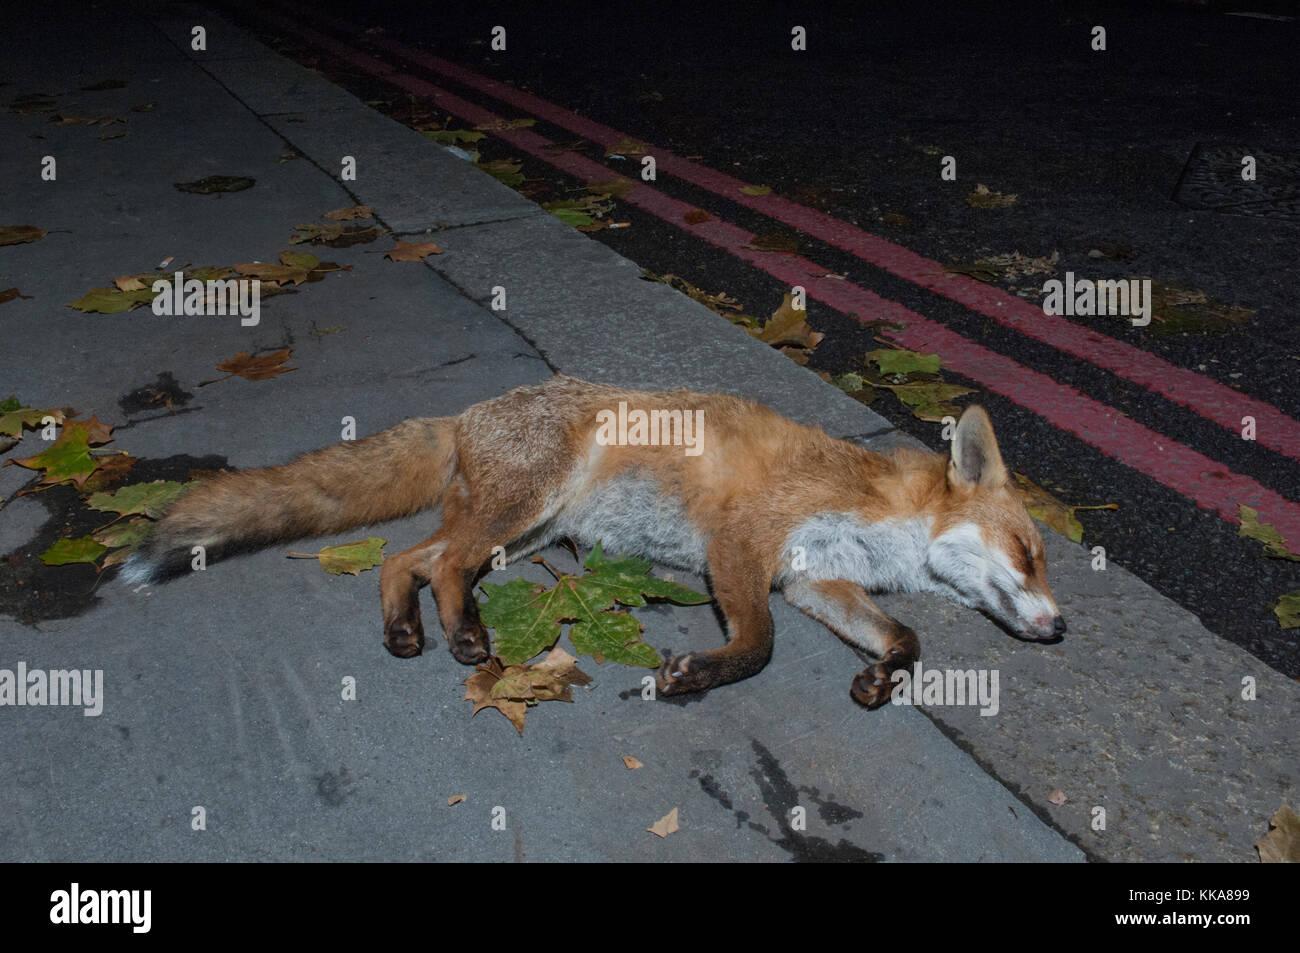 urban Red Fox, Vulpes vulpes, killed on road by car, London, United Kingdom - Stock Image